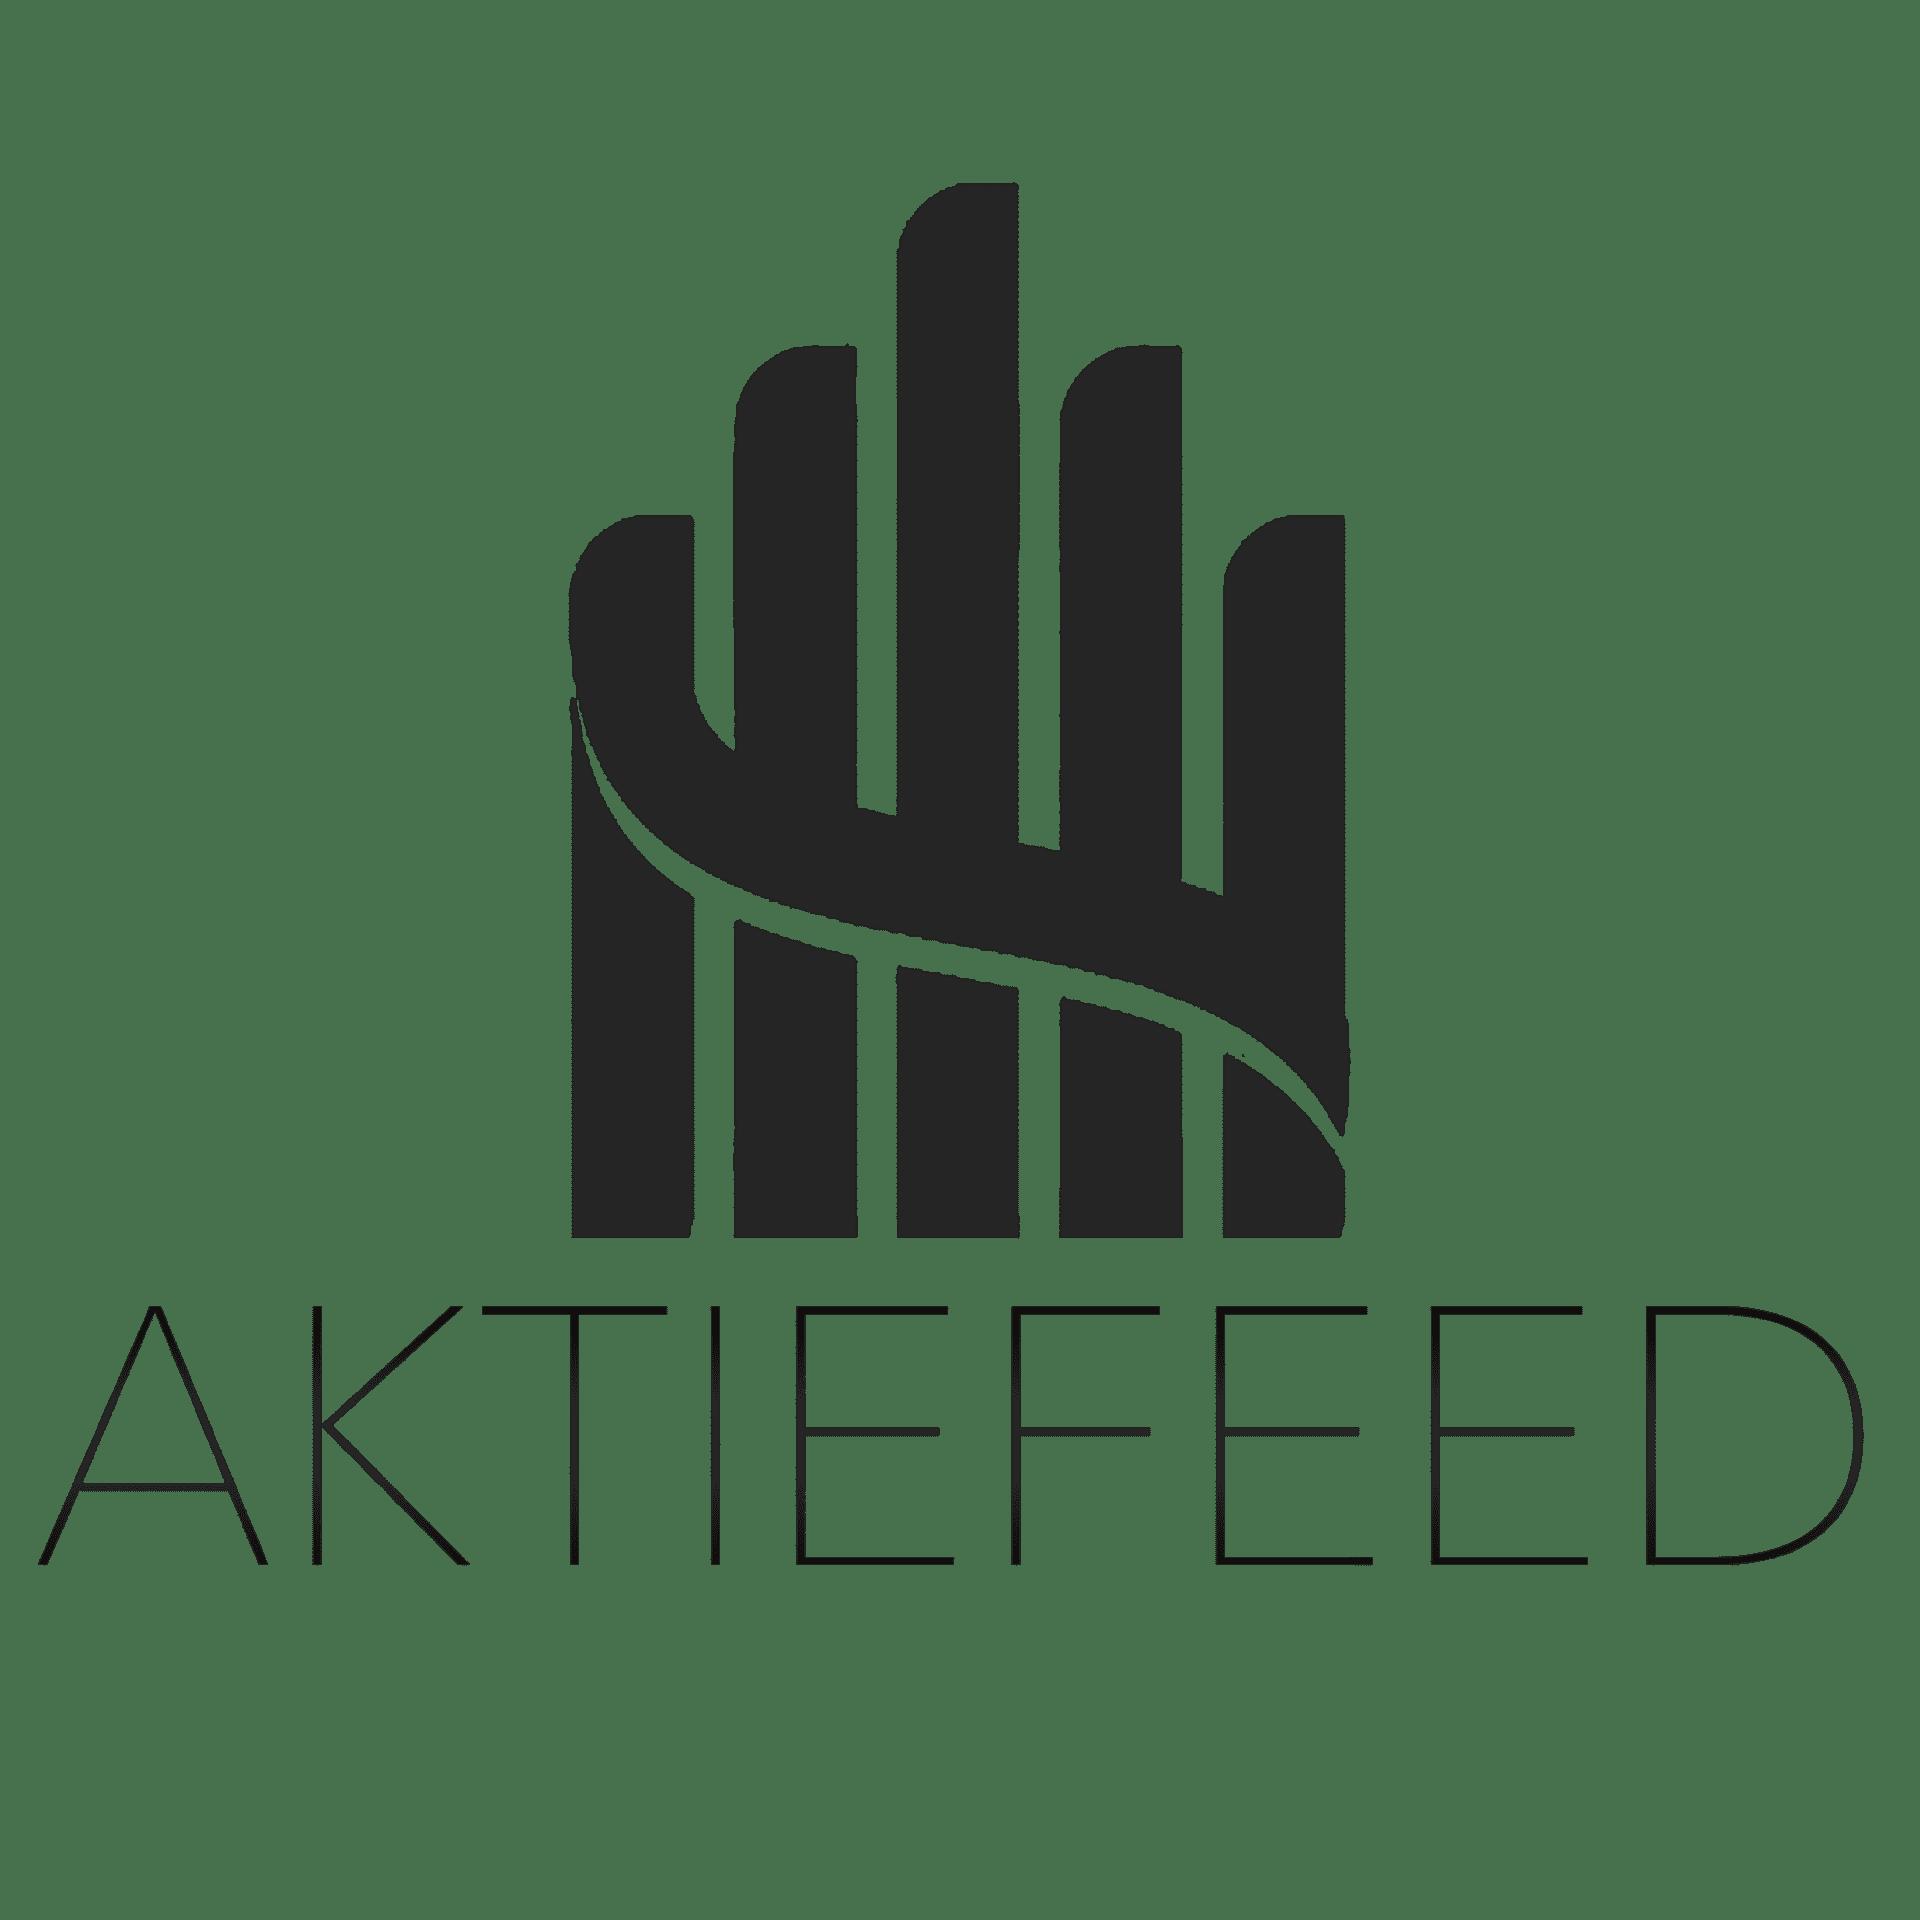 AKTIEFEED logo-aktiebloggar